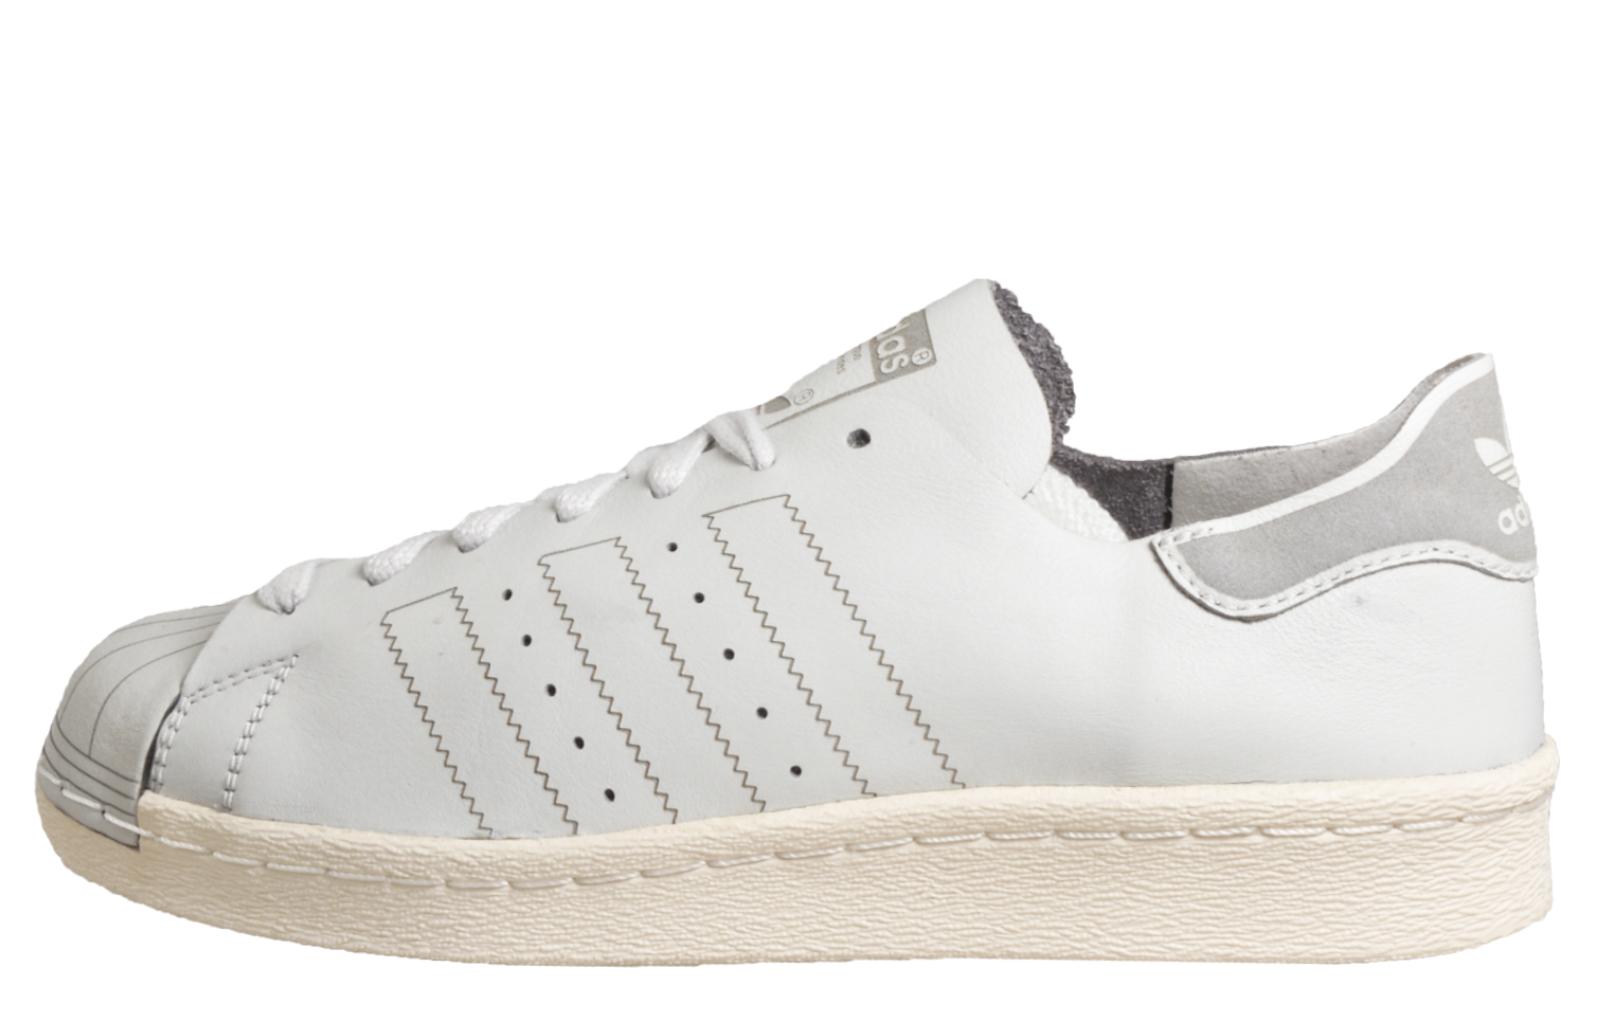 huge selection of 3e6b1 33e89 Adidas Originals Superstar 80s Decon Women s Casual Vintage Trainers B Grade